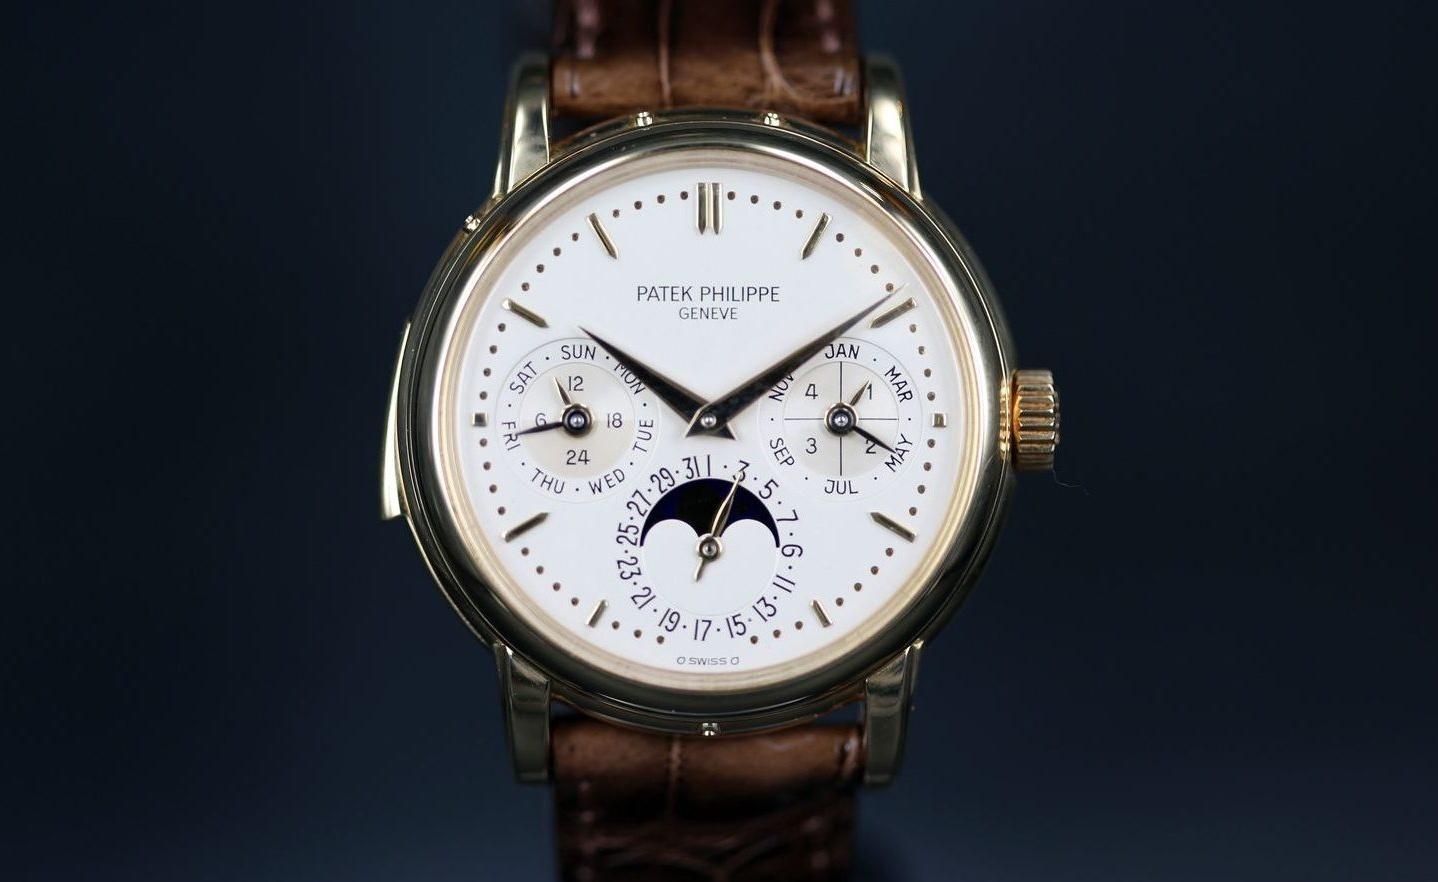 Patek Philippe Brand History